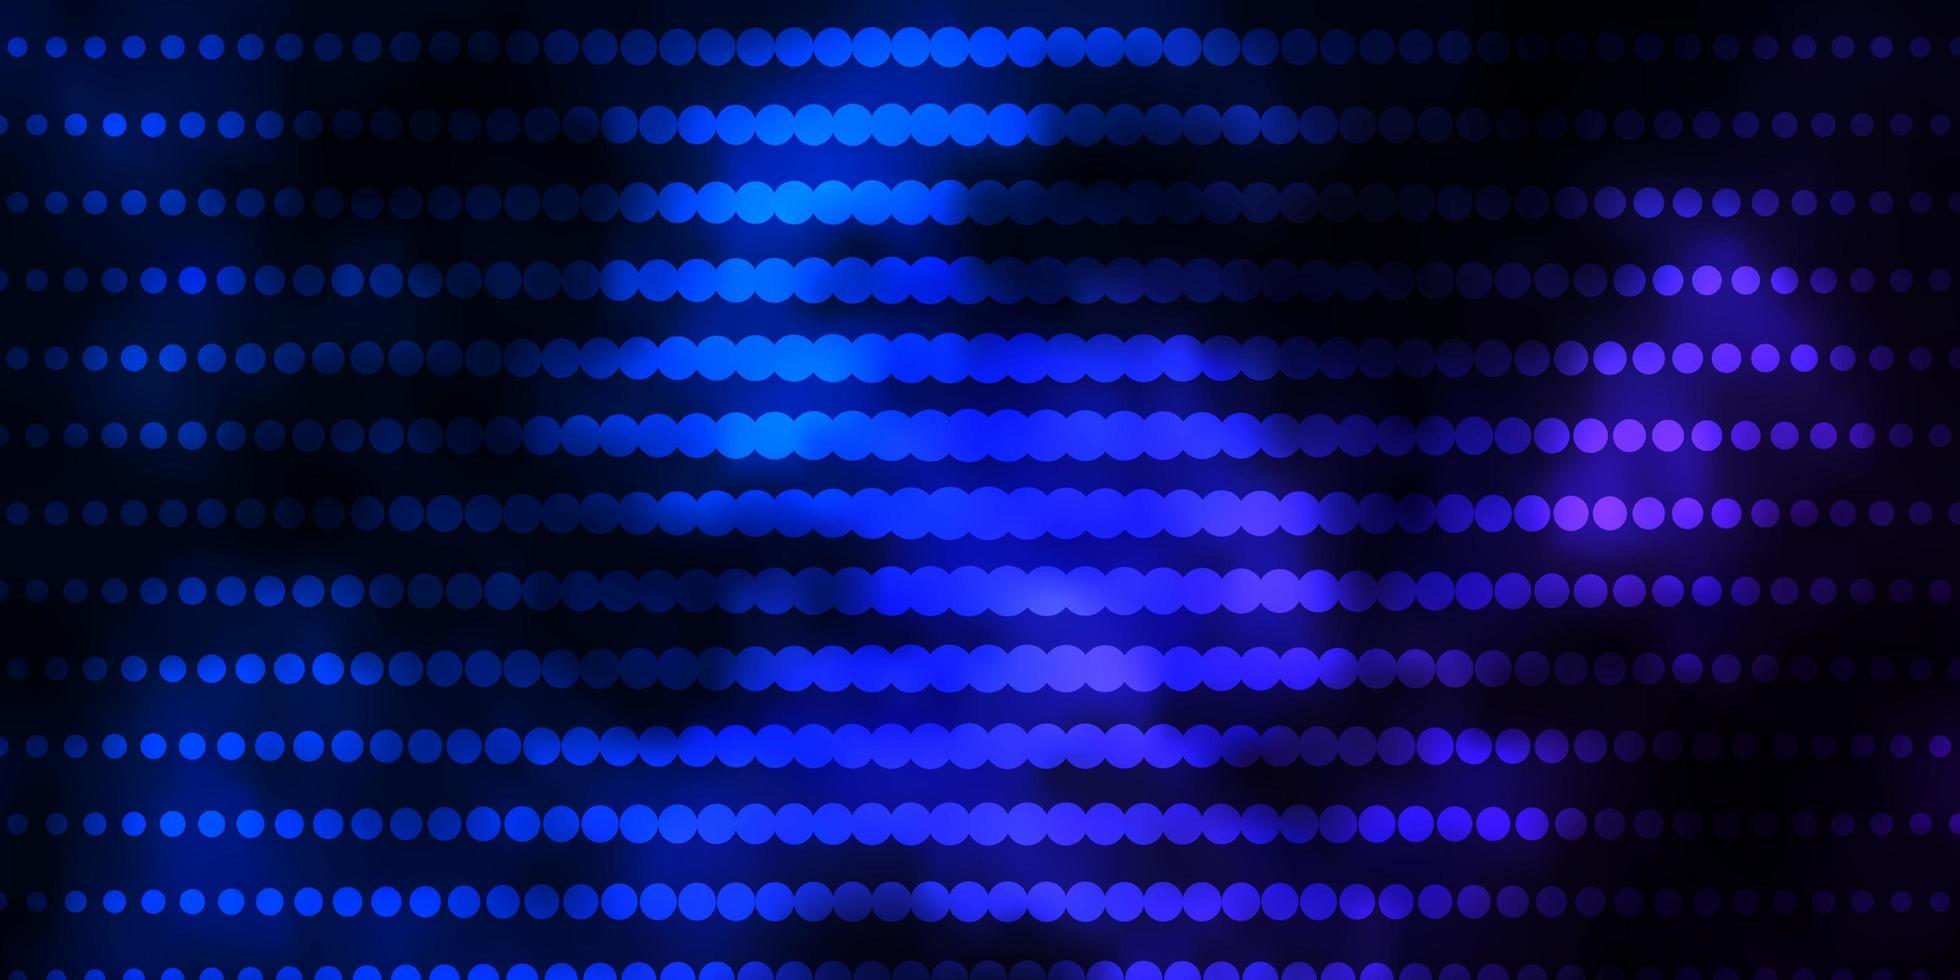 dunkelrosa, blaues Vektorlayout mit Kreisen. vektor